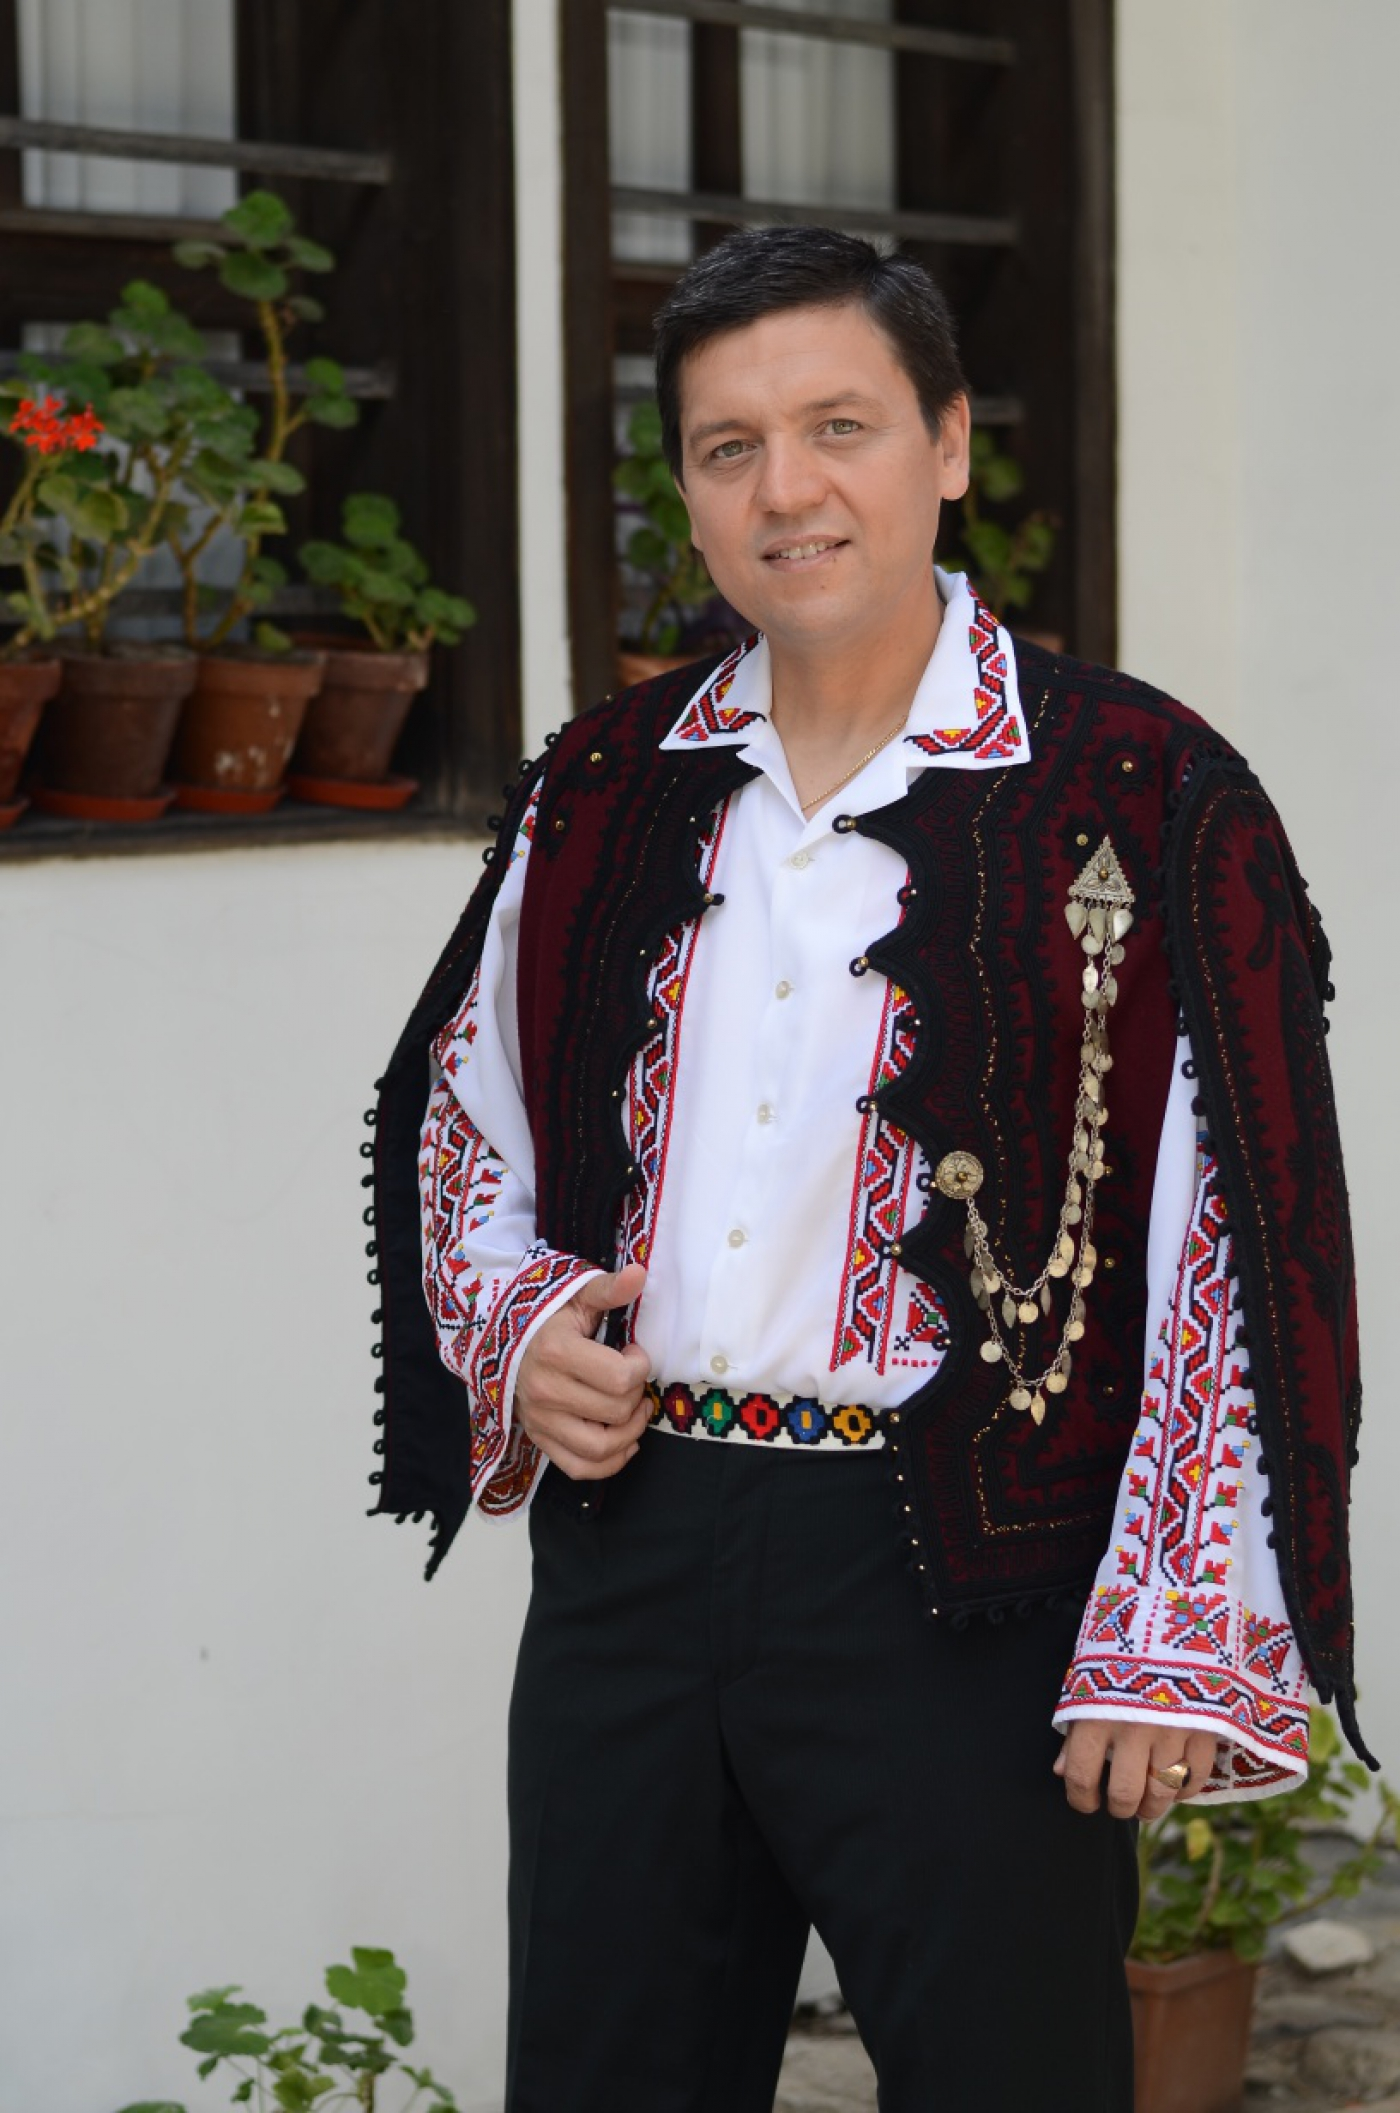 Vasilvalkanov0003